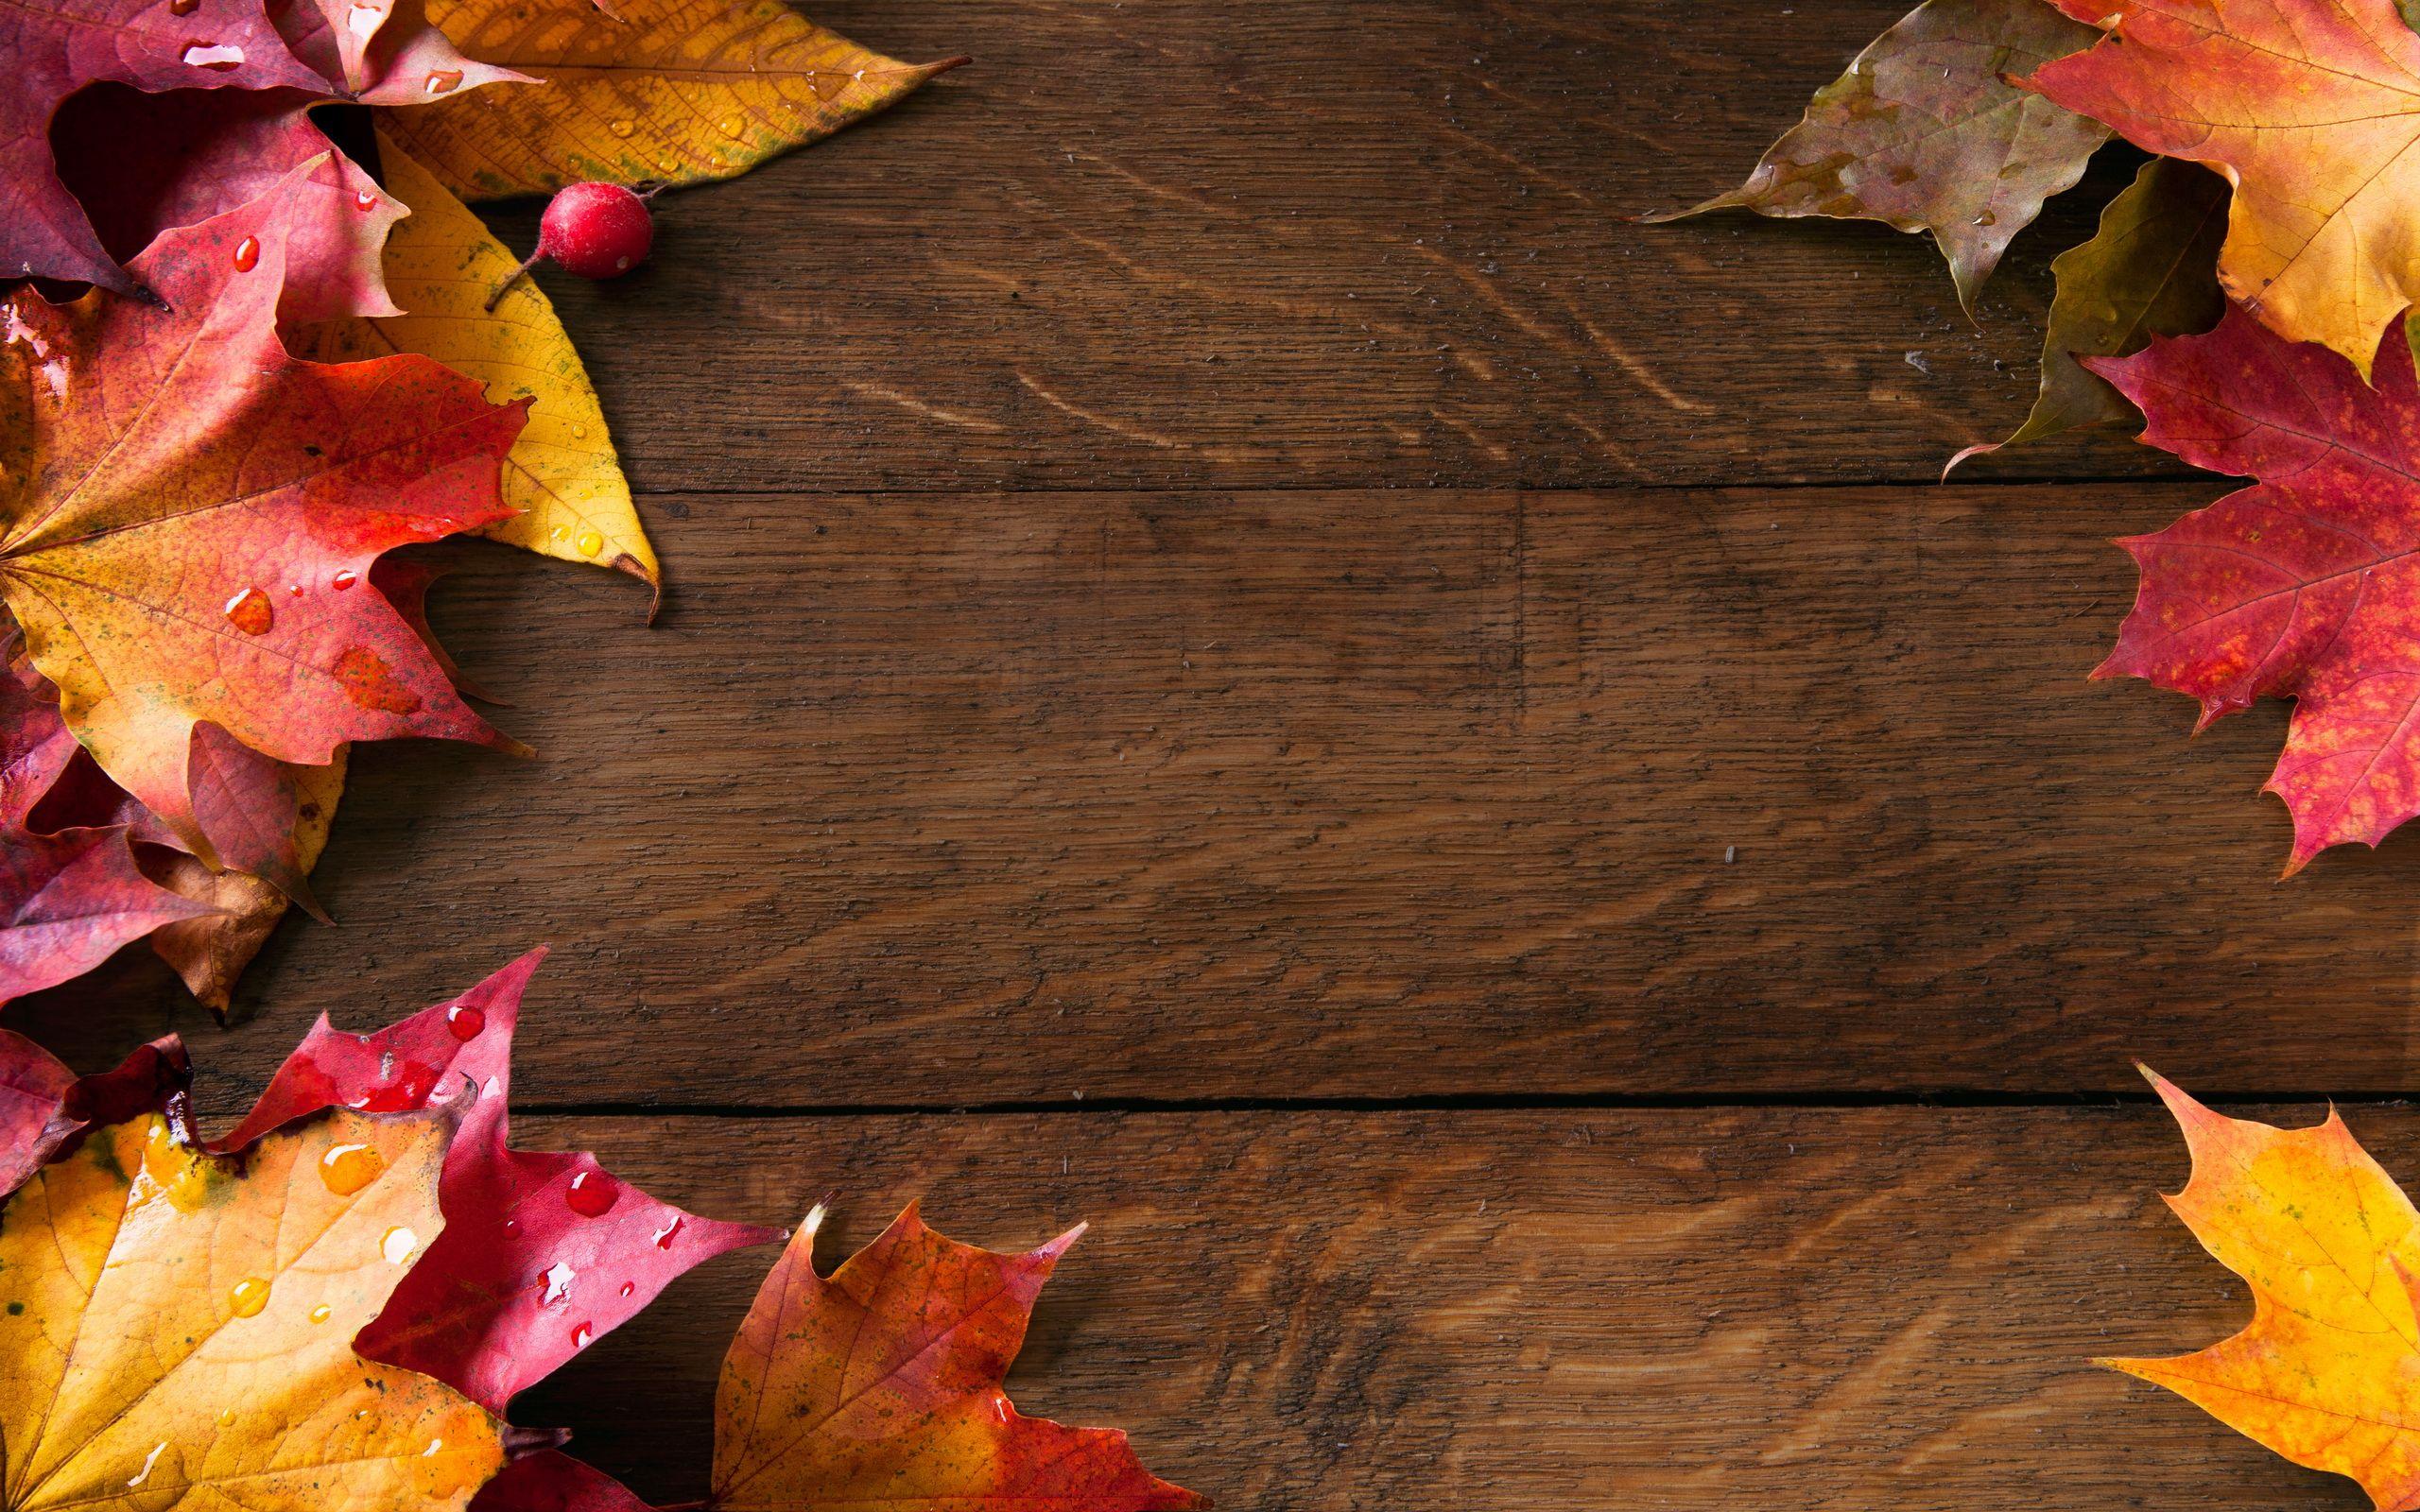 Autumn Wallpaper Wonderful C53 Wallpaperel Autumn Wallpaper Hd Desktop Wallpaper Fall Fall Wallpaper